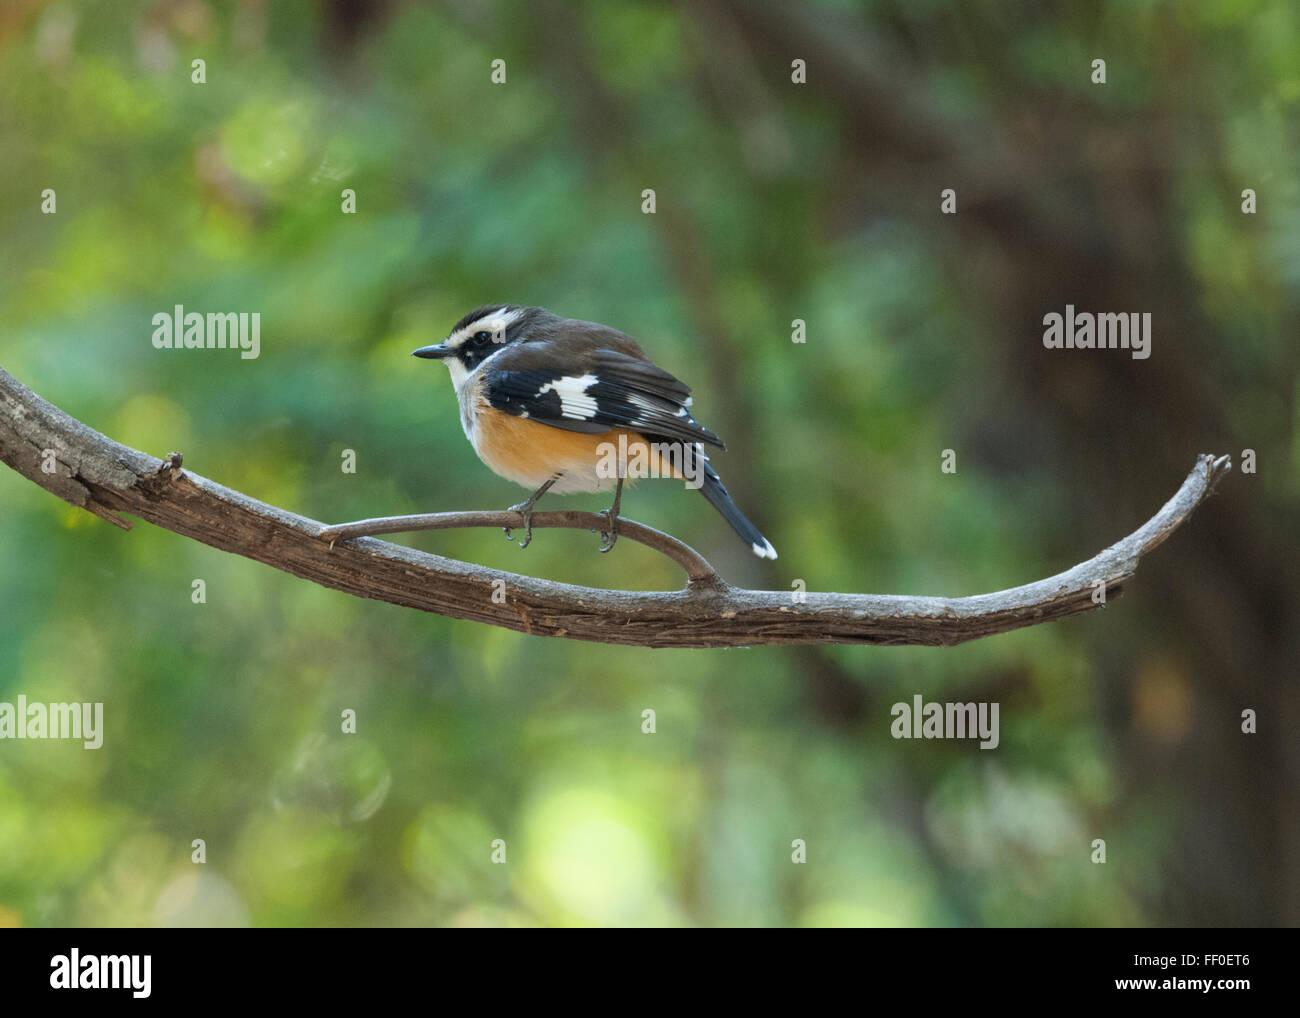 White-browed Robin (Poecilodryas superciliosa), Lawn Hill, Queensland, Australia - Stock Image